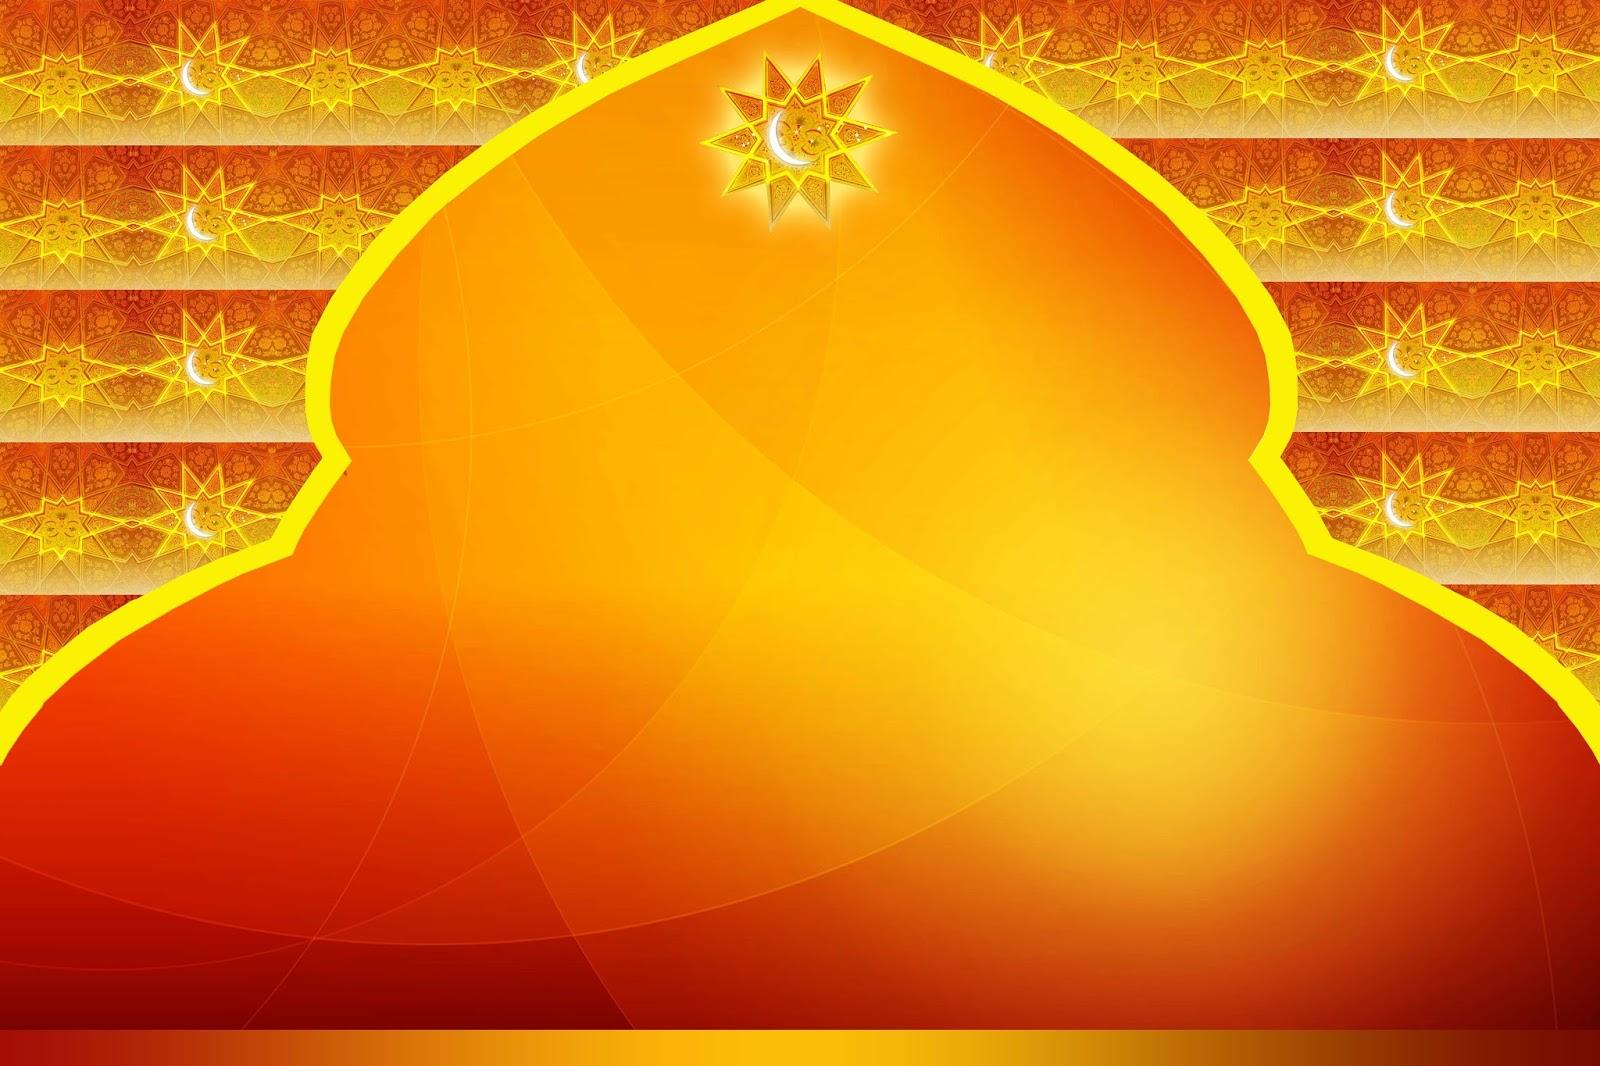 background islami coklat